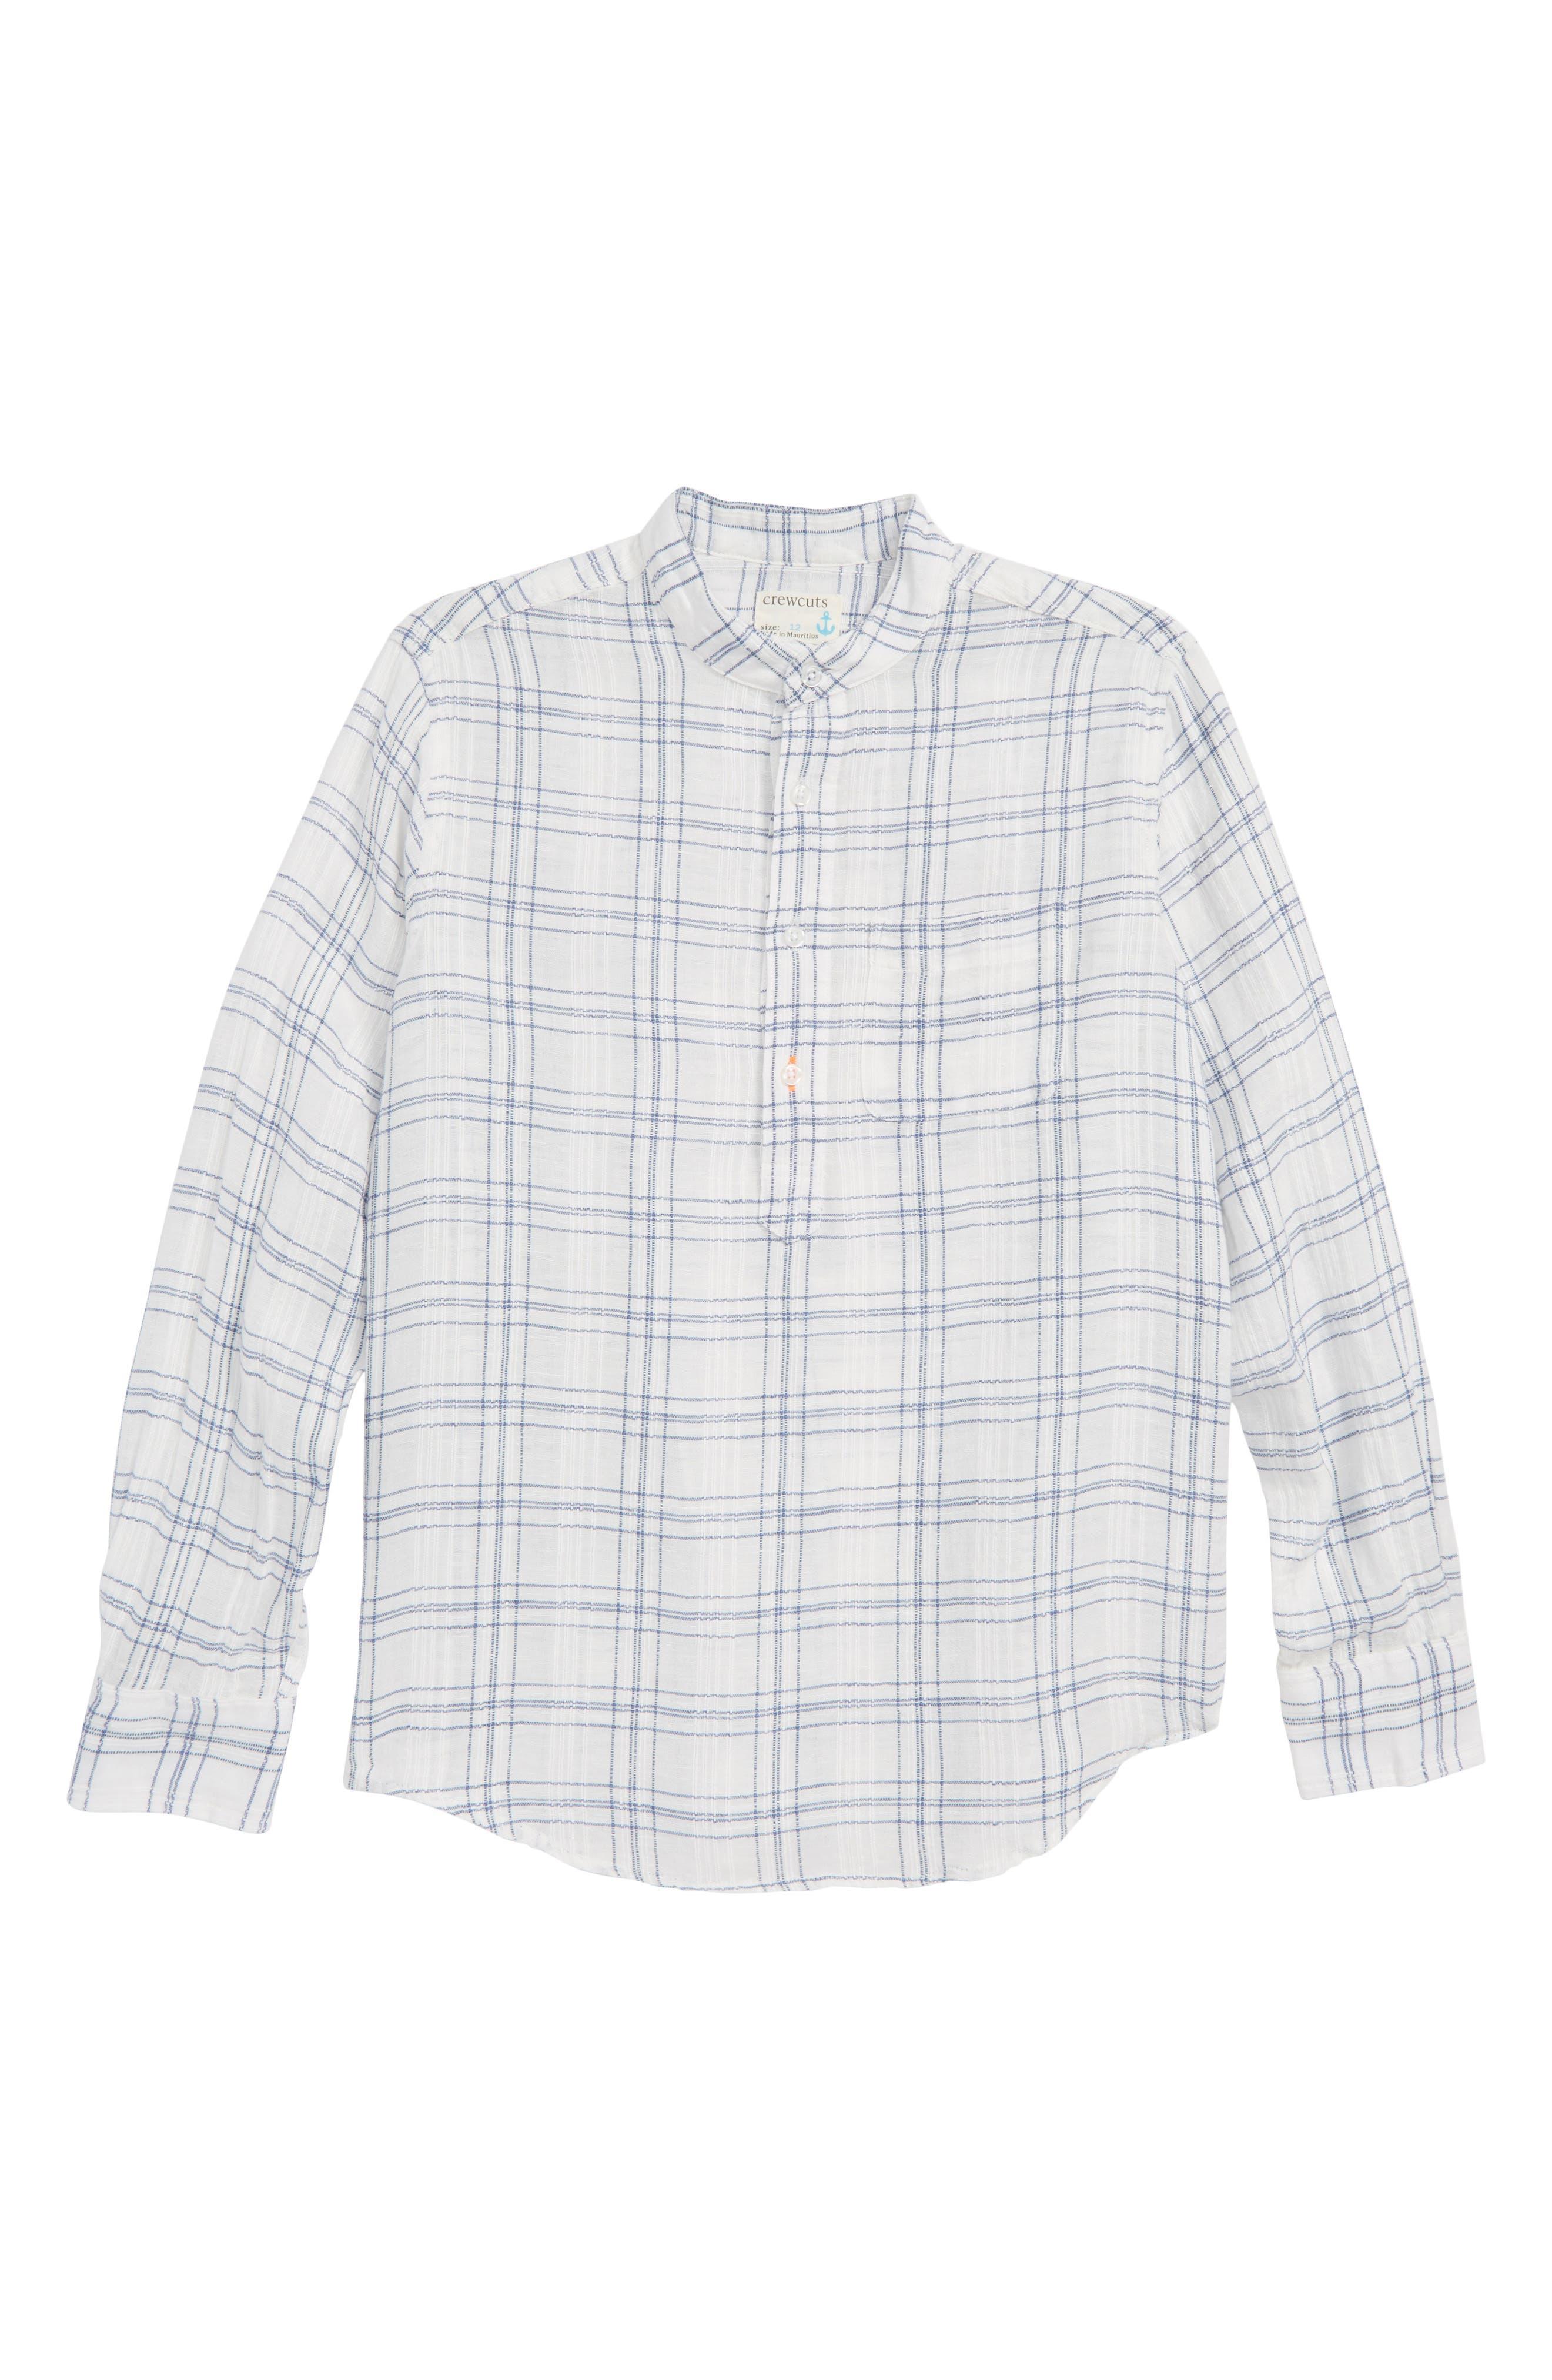 CREWCUTS BY J.CREW Windowpane Band Collar Linen Blend Shirt, Main, color, 900